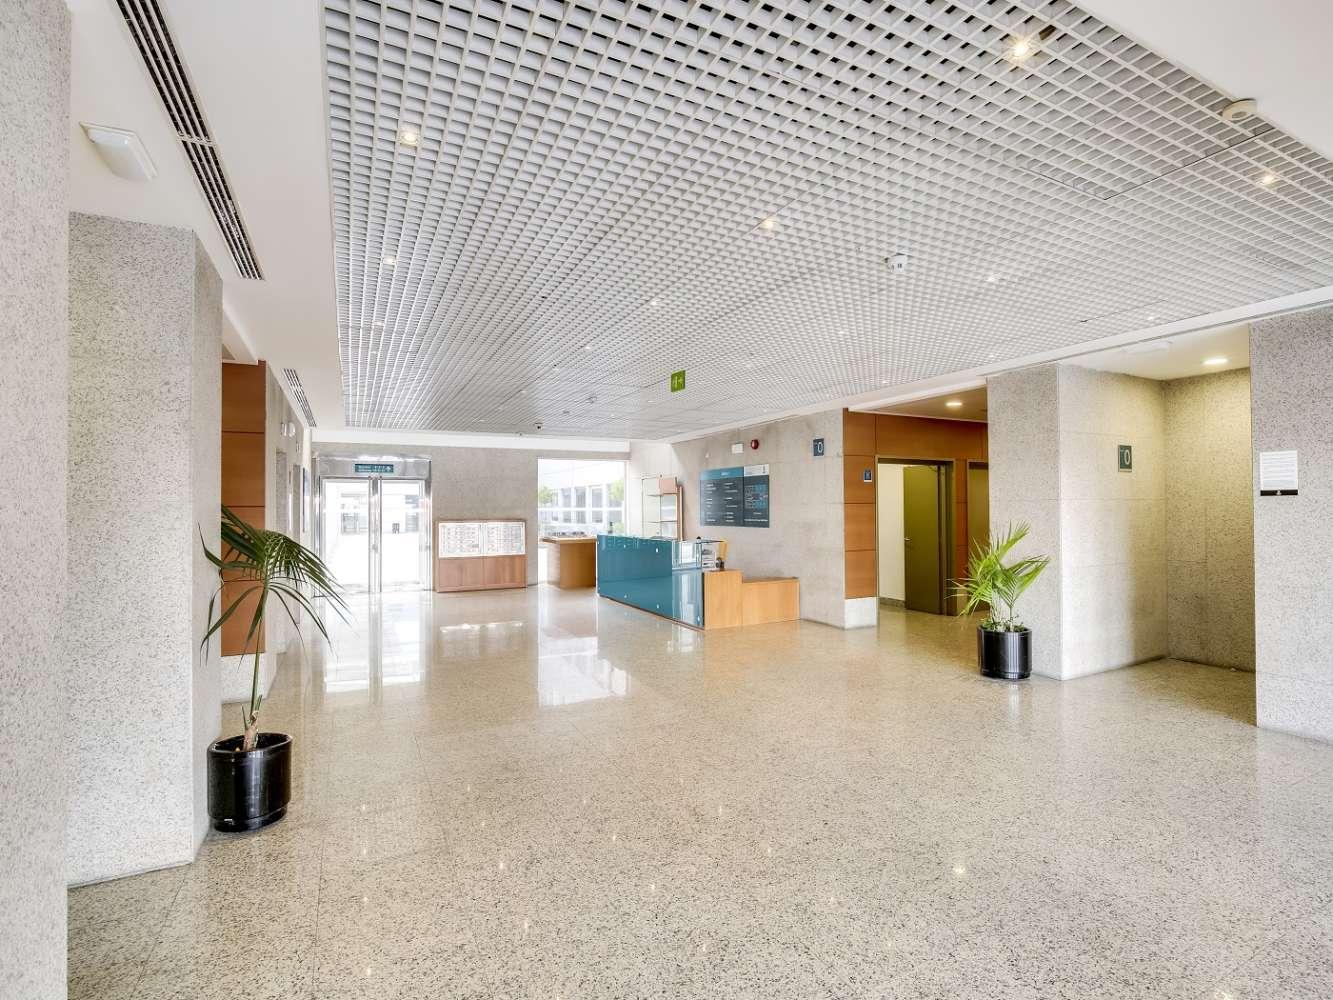 Oficina Las rozas de madrid, 28232 - Edificio 3. P.E. Alvia - 14367